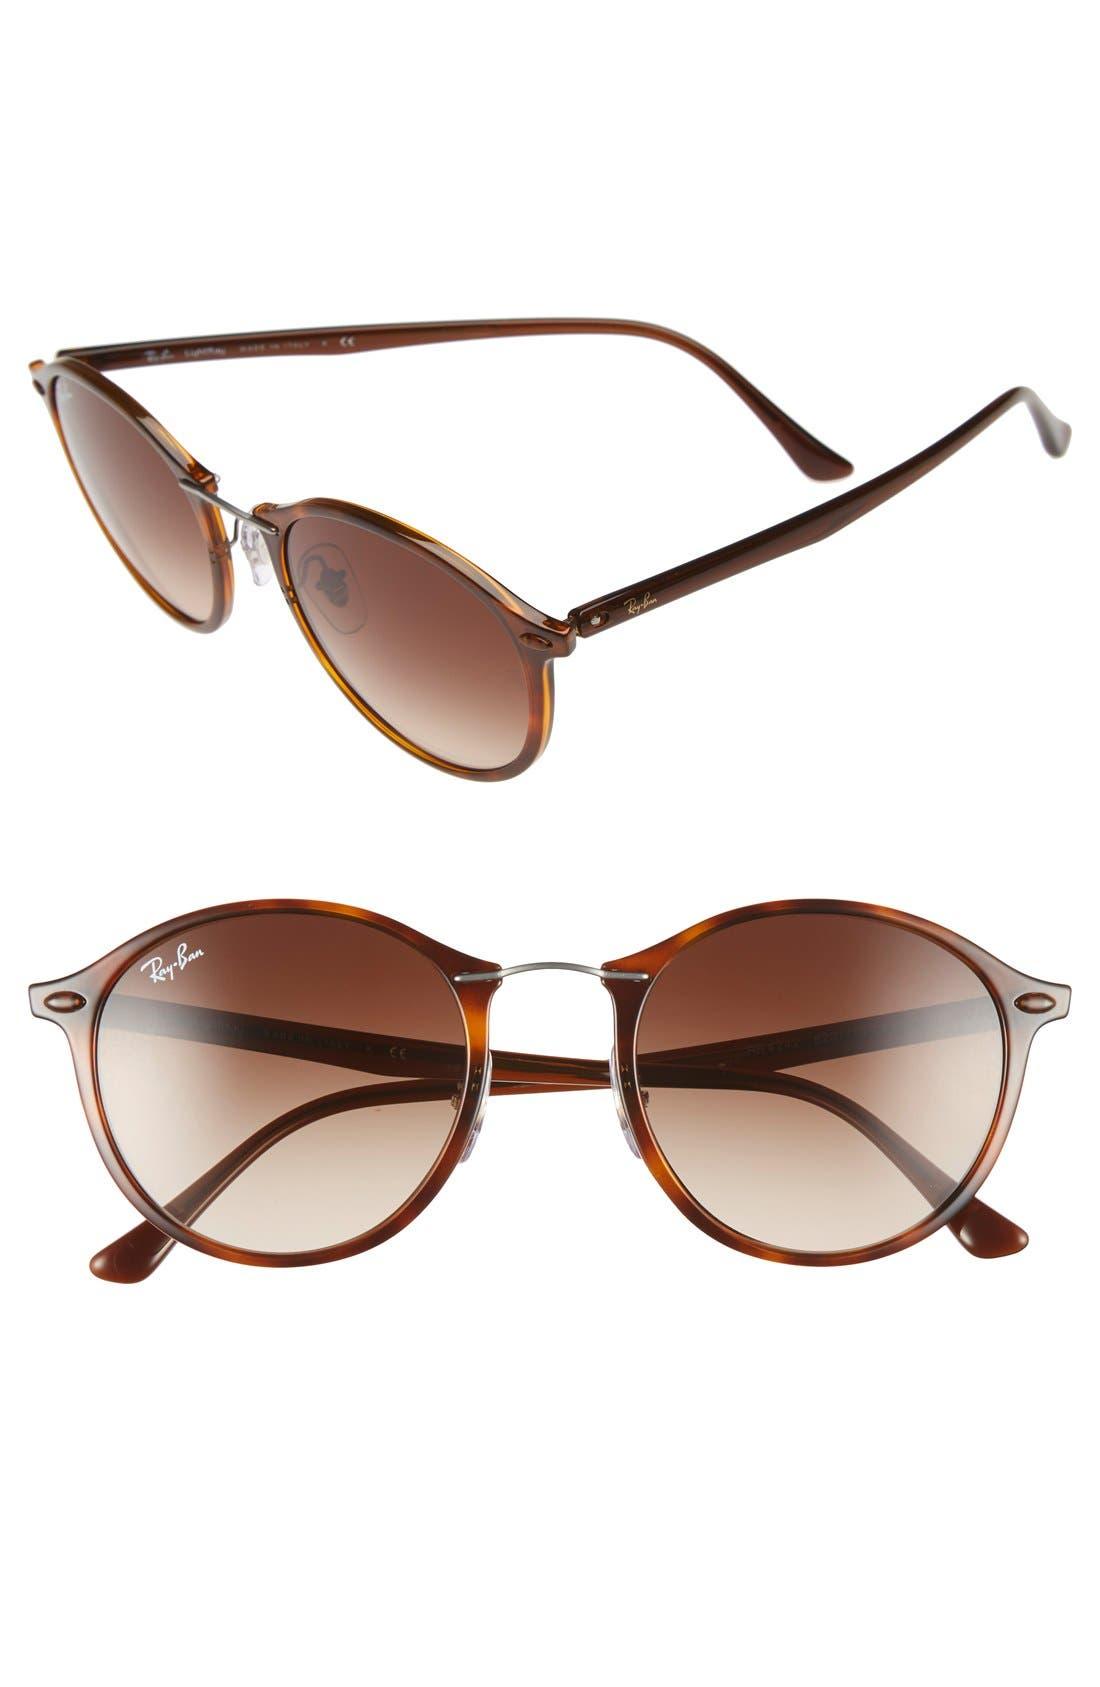 49mm Round Sunglasses,                         Main,                         color, Lt Havana